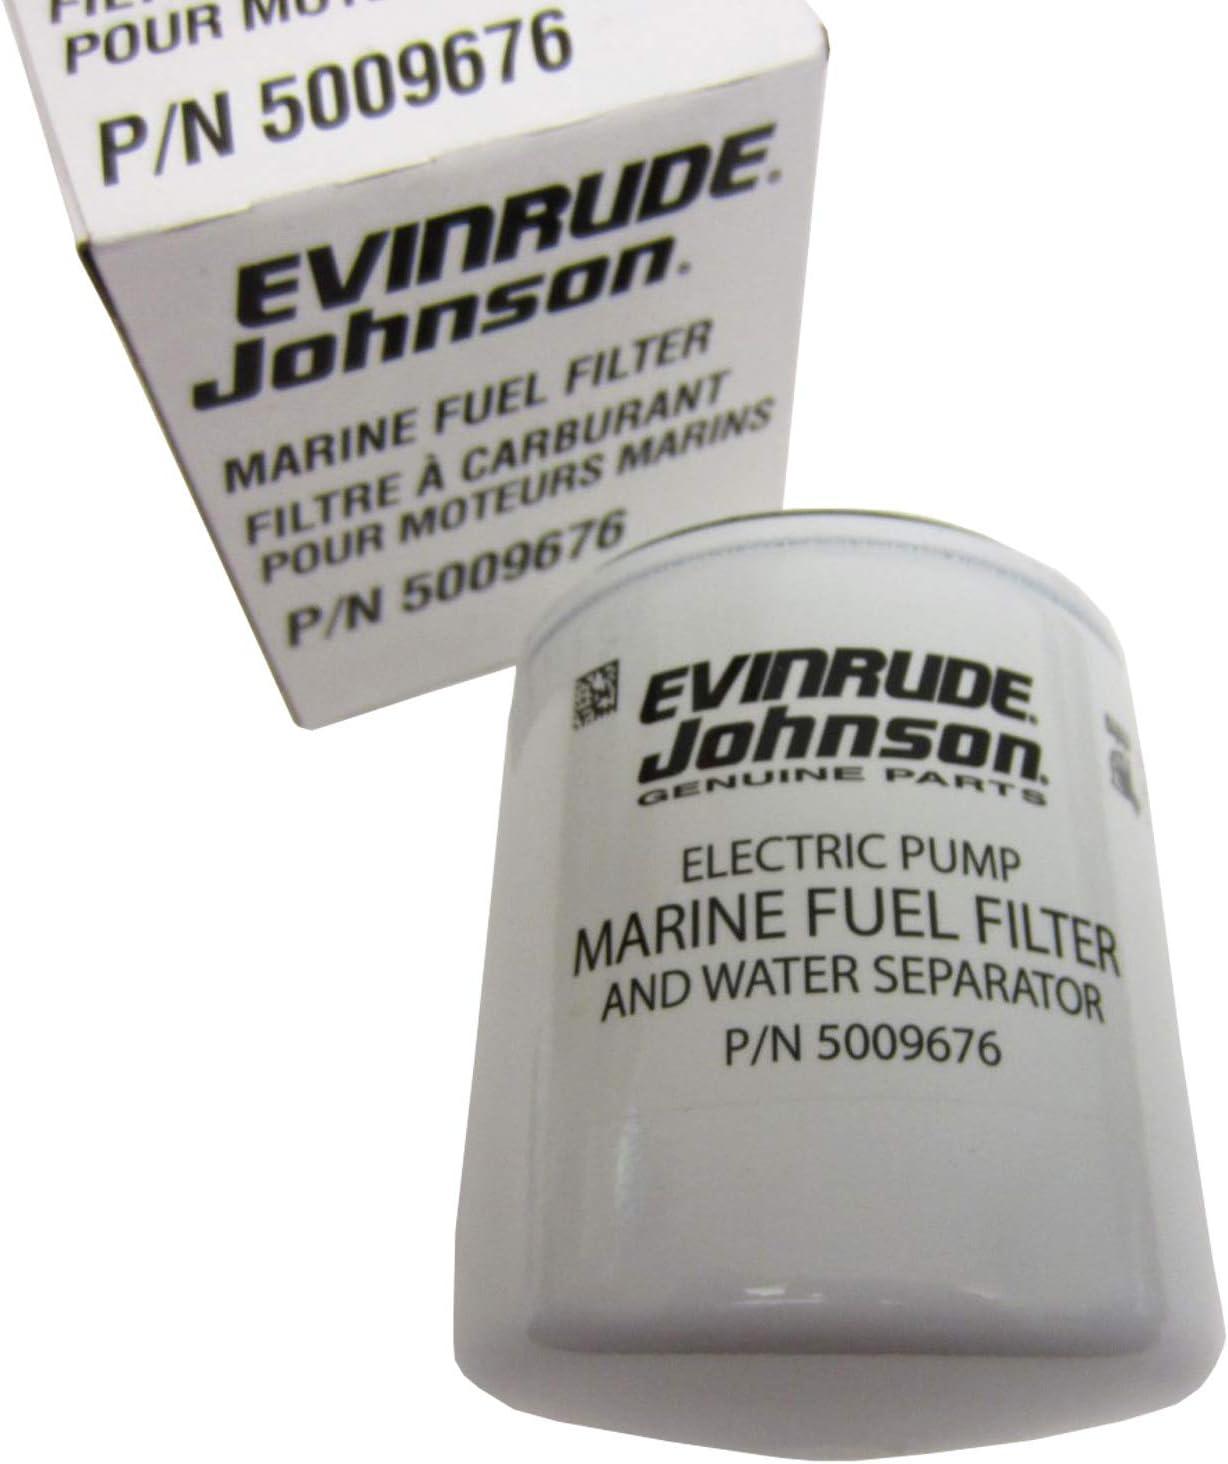 Lot Of 2 OMC Evinrude Johnson Marine Oil Filter Part 502901 S4-S1